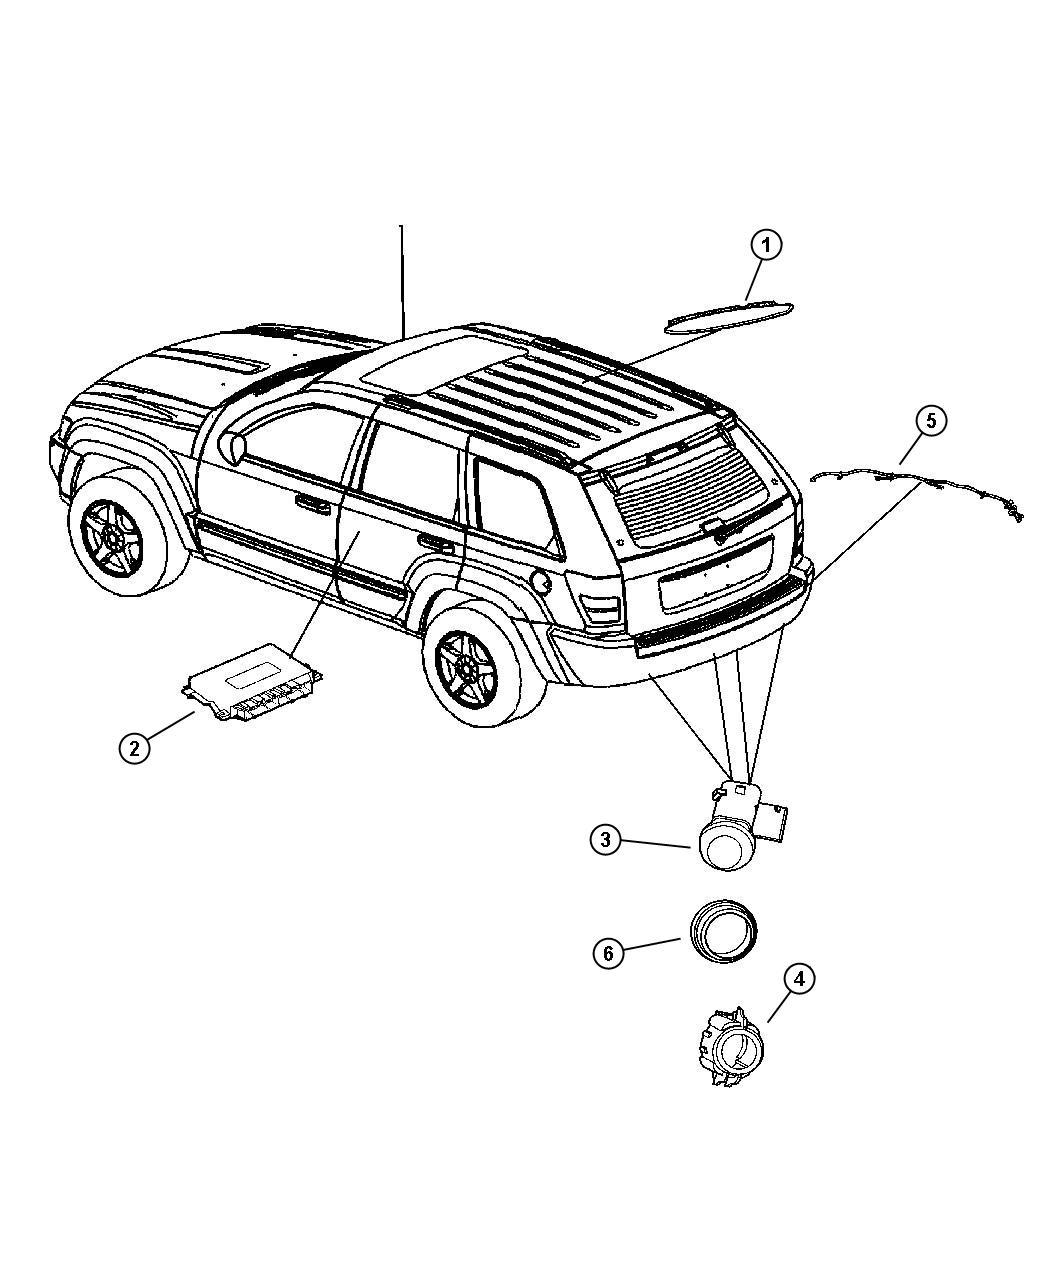 Jeep Grand Cherokee Harness Wiring Rear Fascia